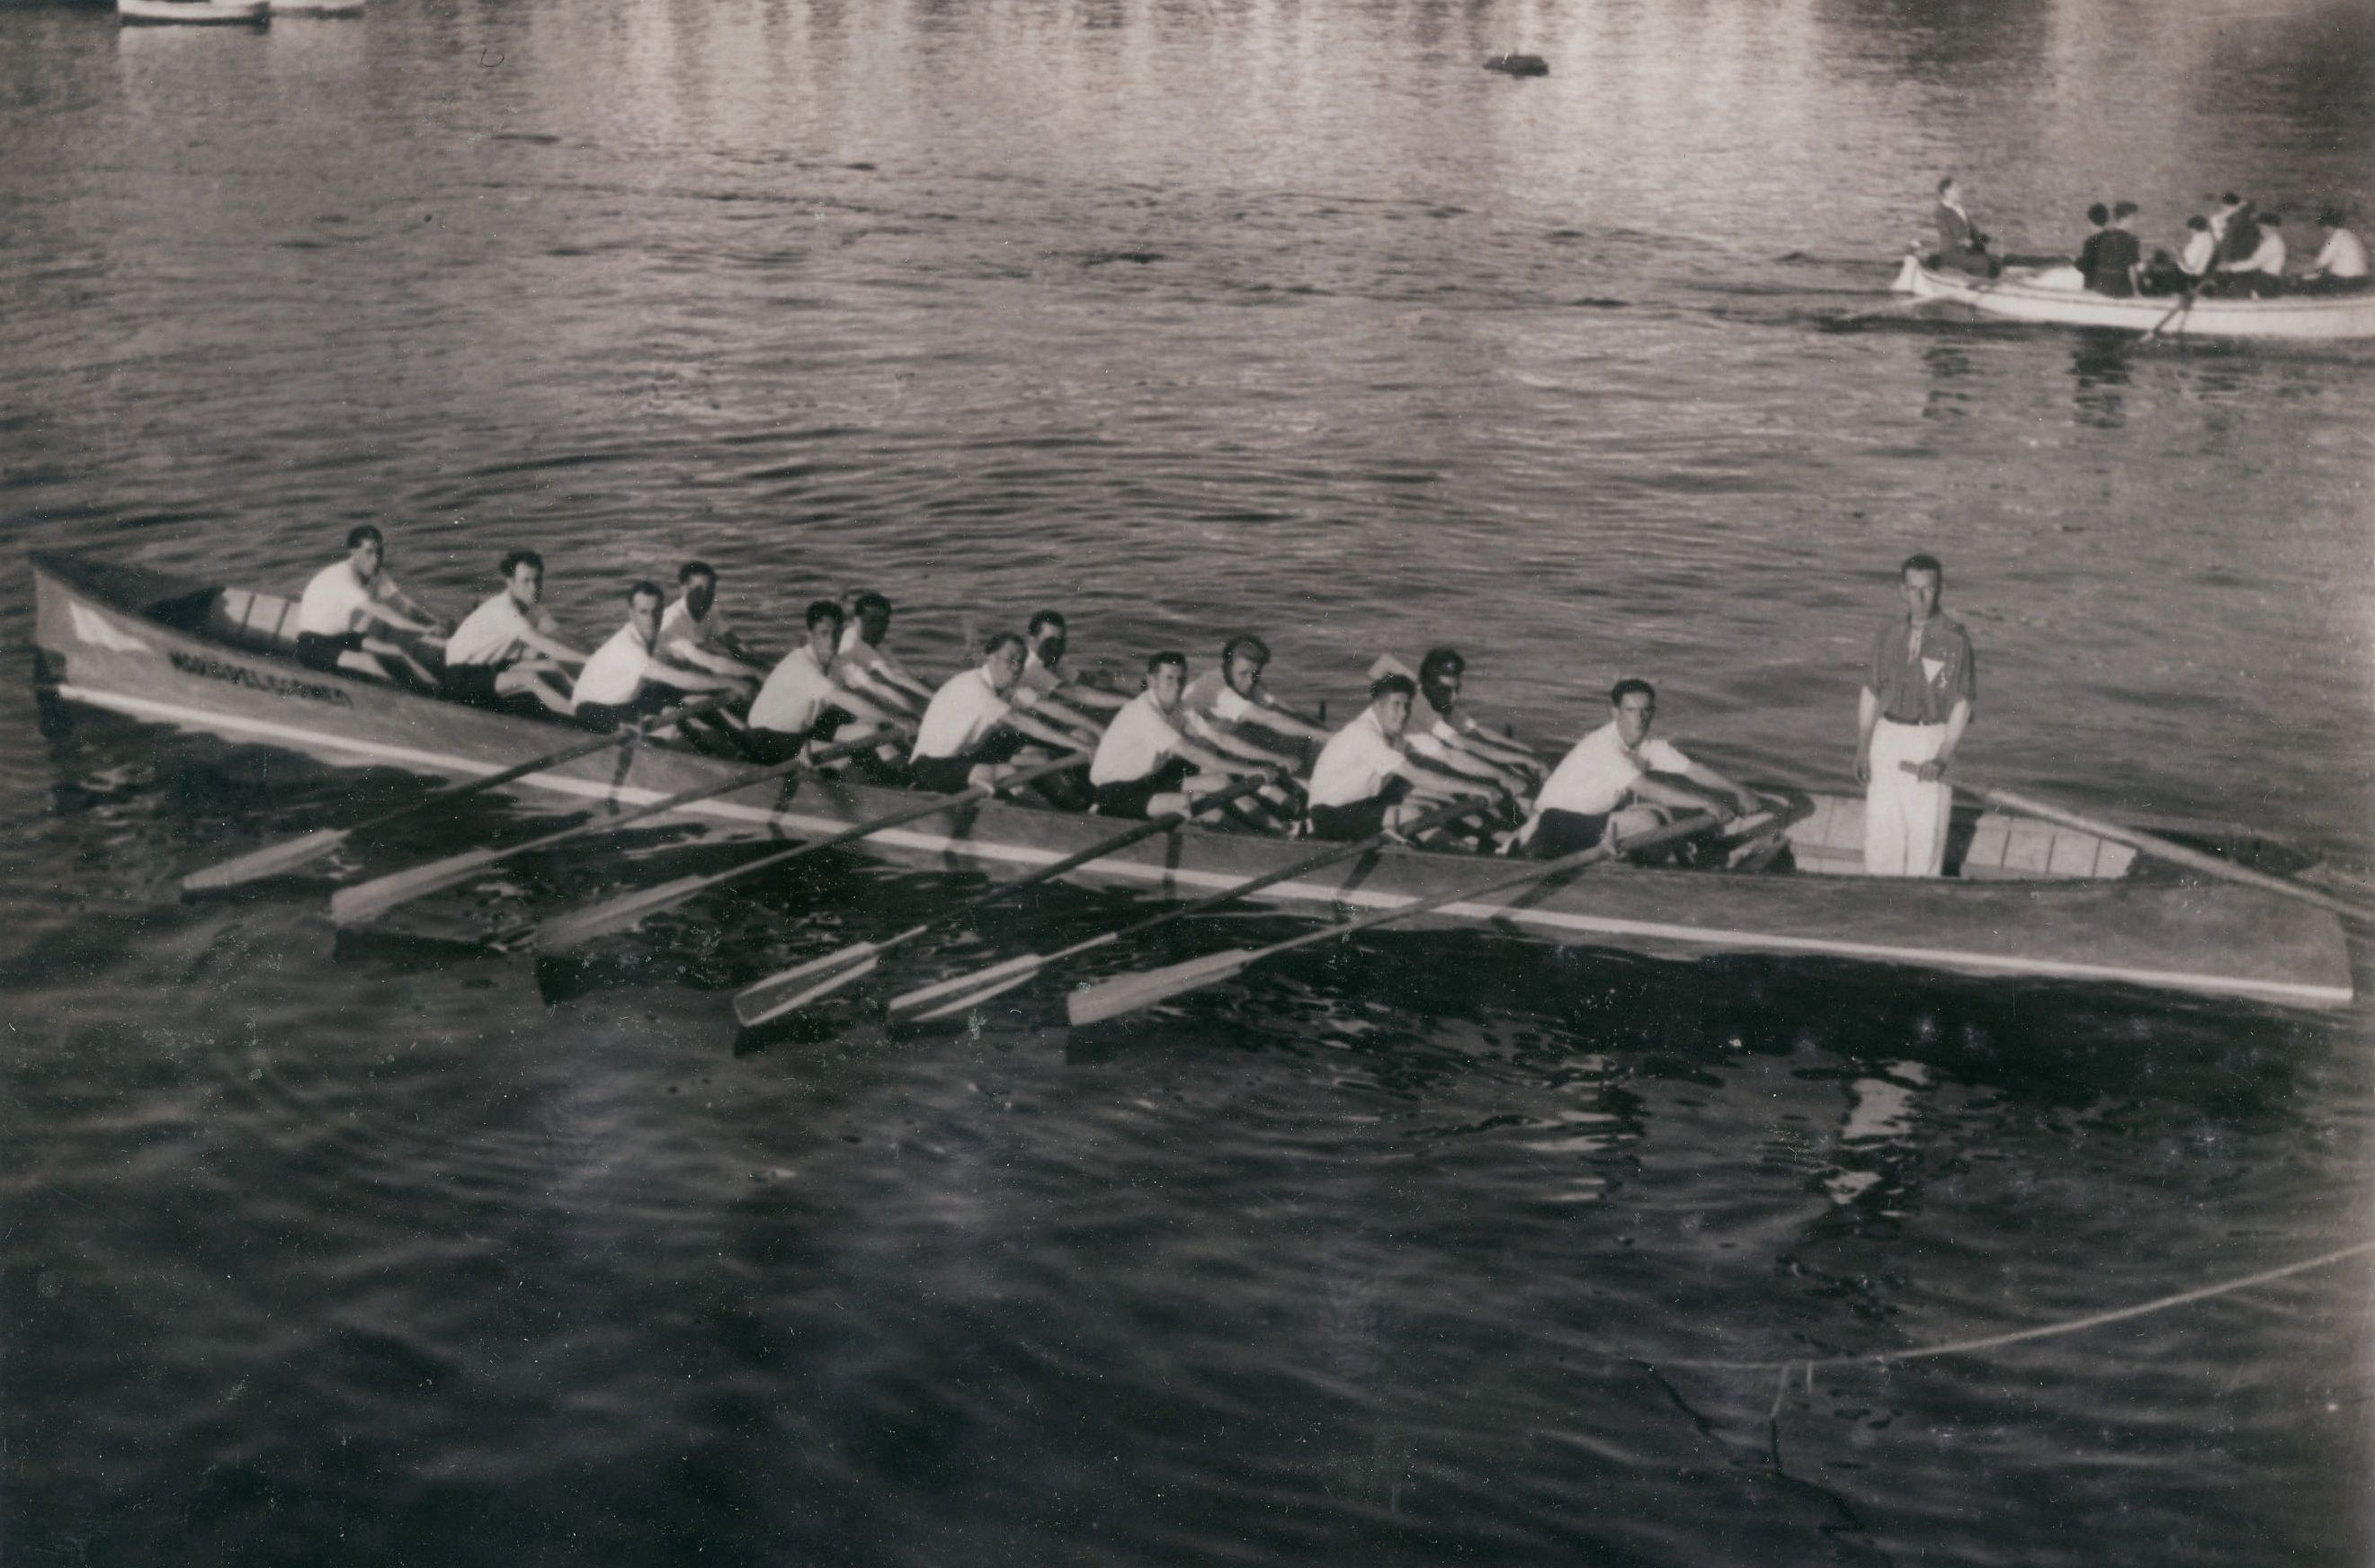 Traineras Mª del Carmen de San Pedro de Visma, vencedora das seis regatas da temporada 1944